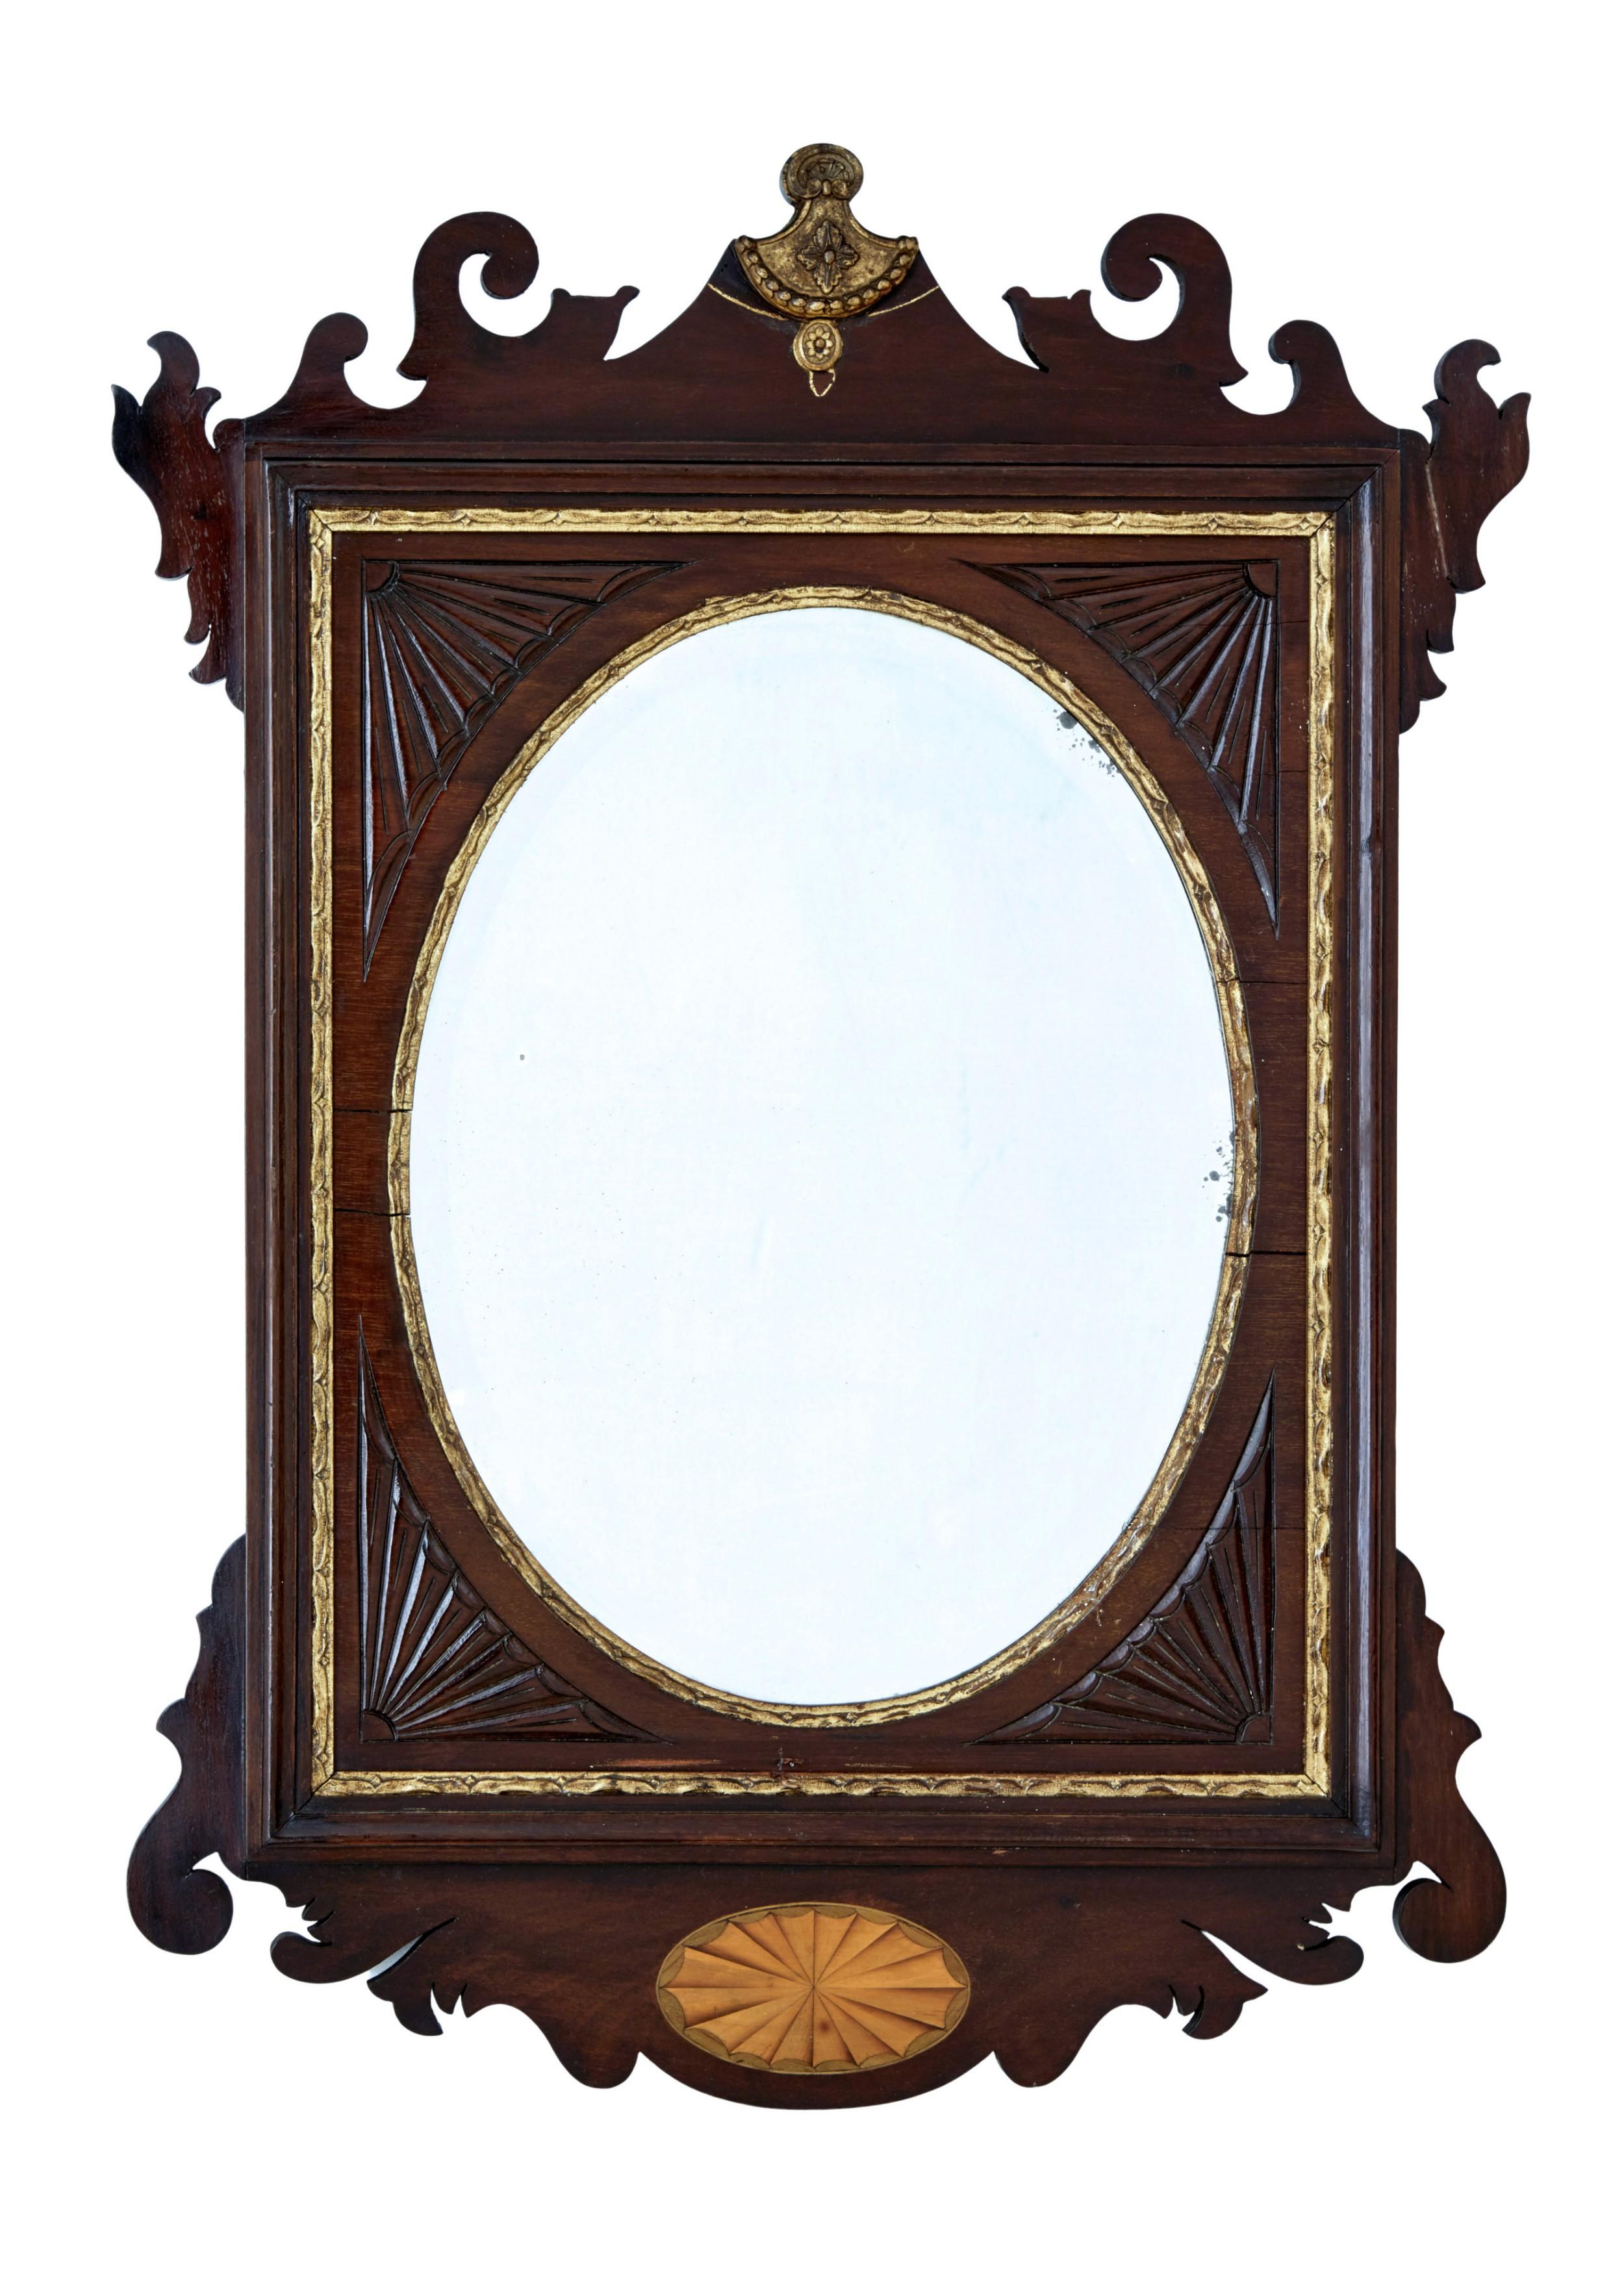 late 19th century american sheraton revival walnut mirror